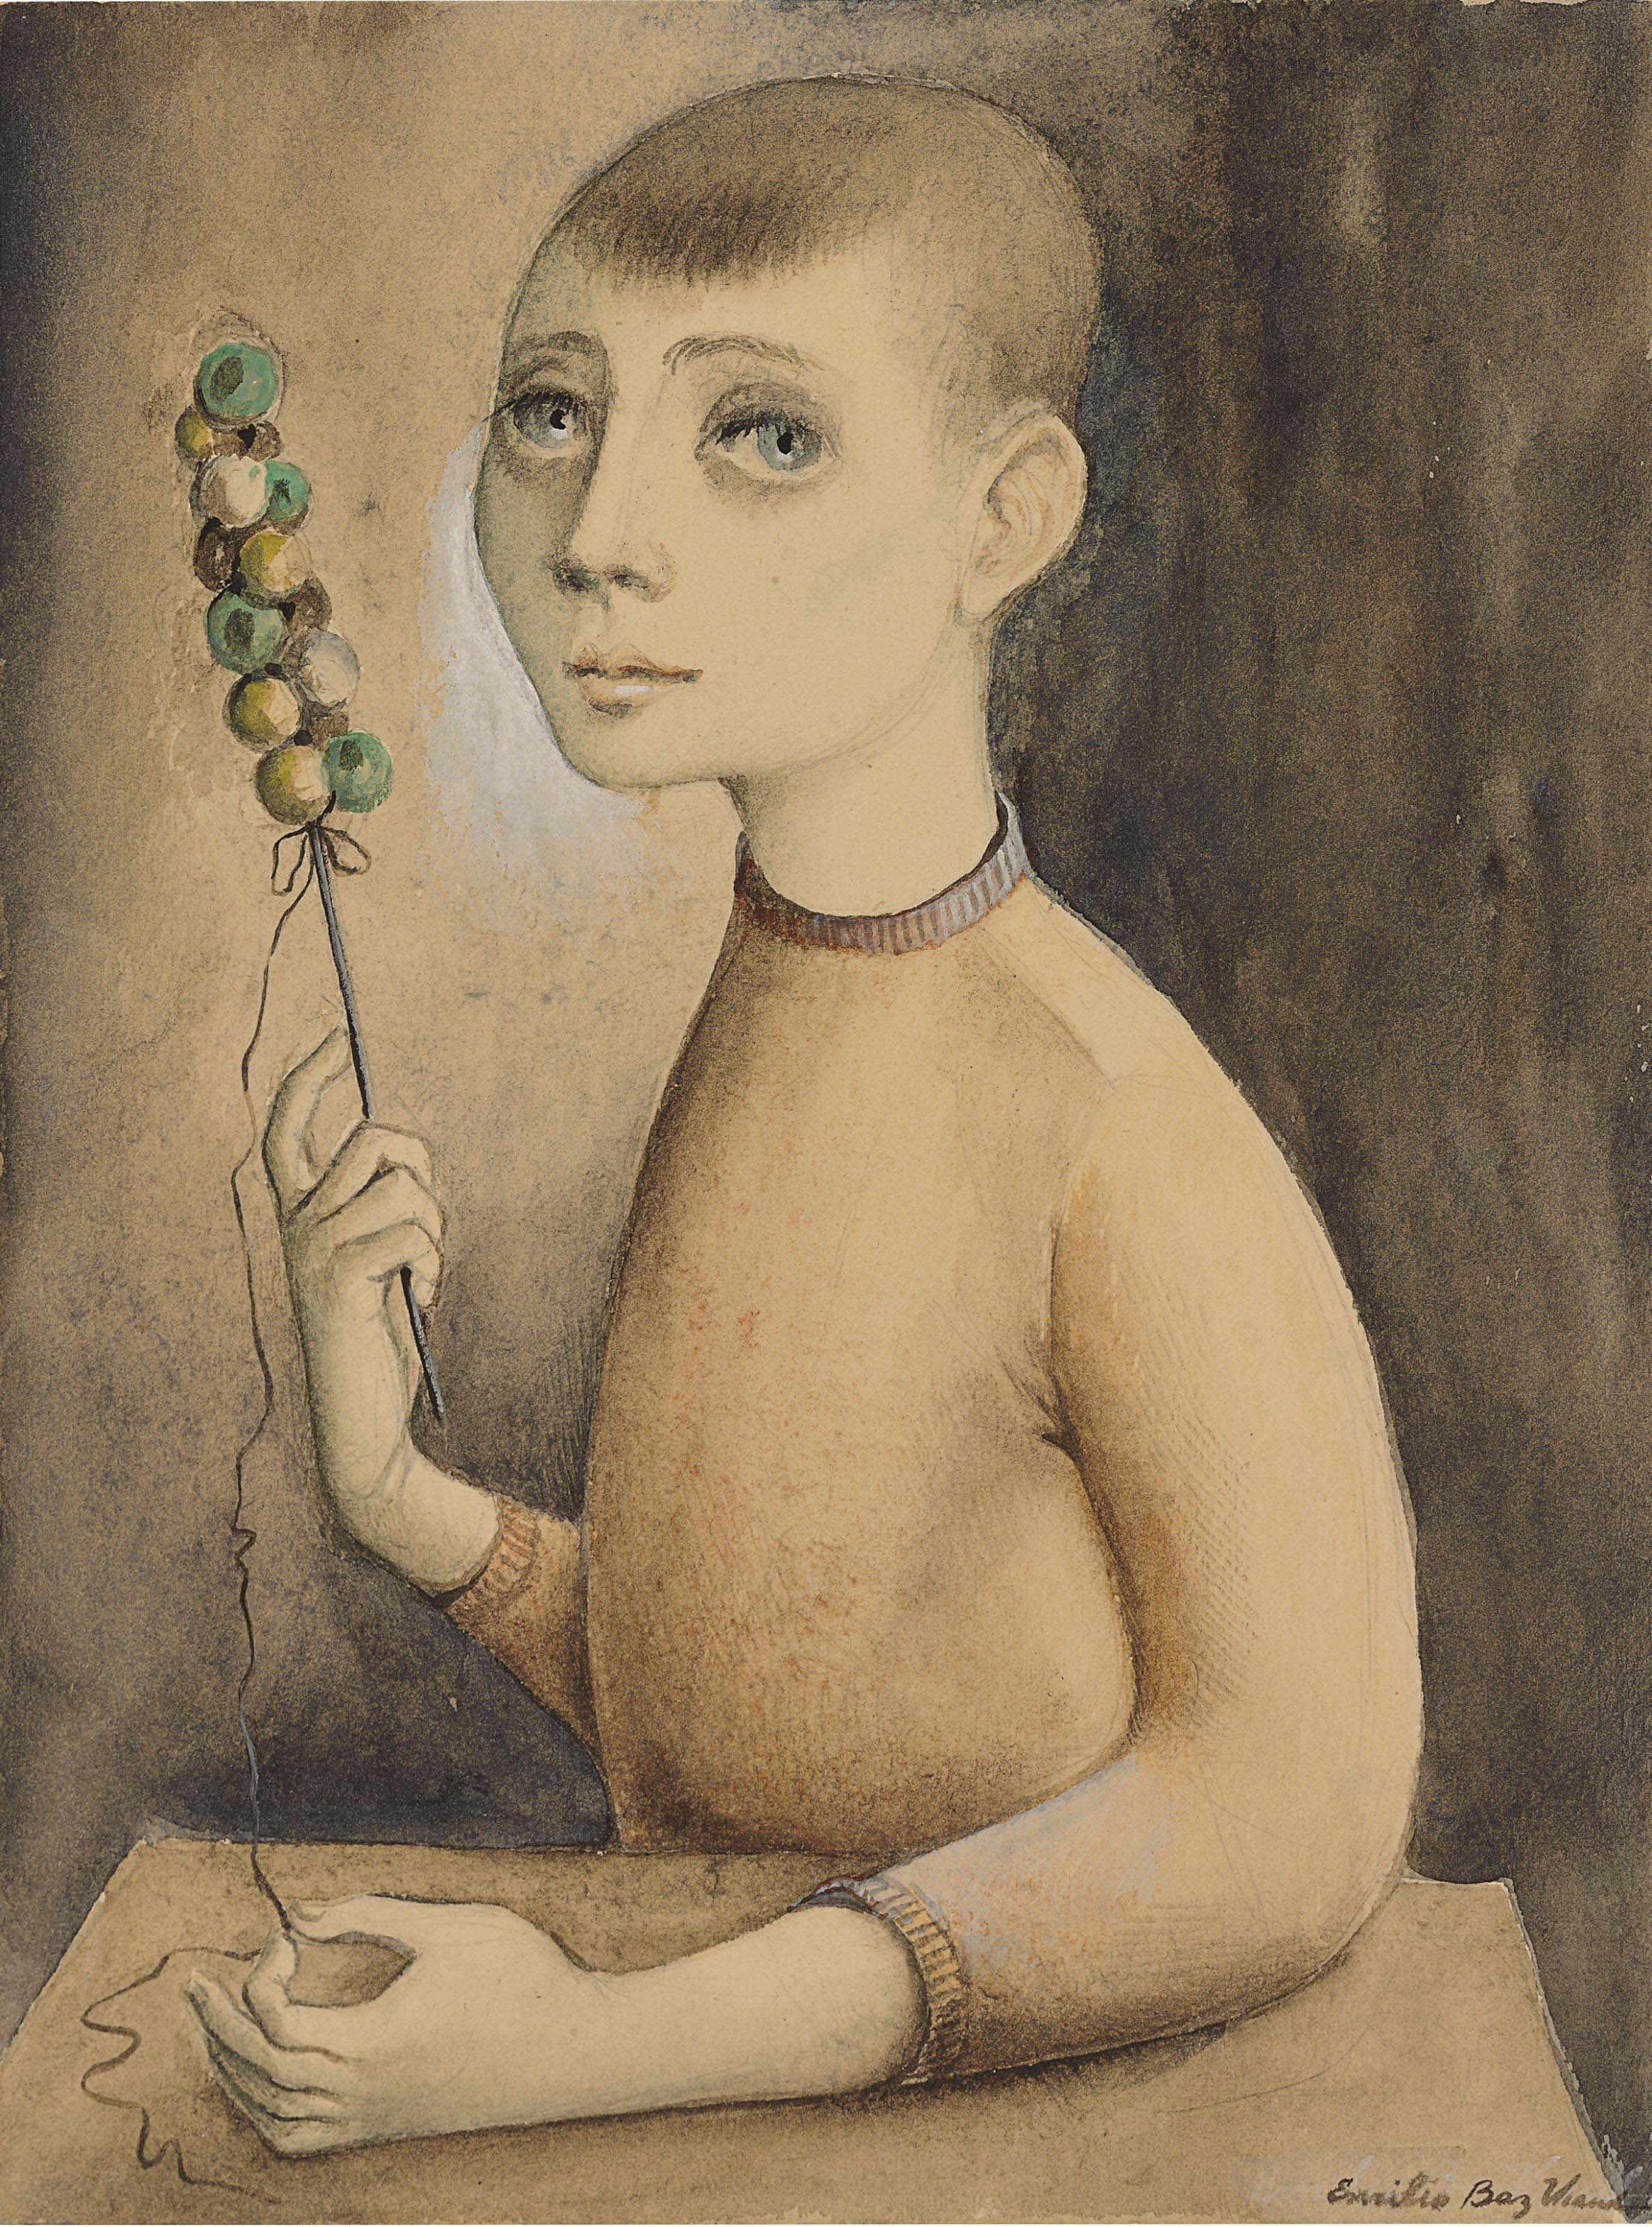 Emilio Baz Viaud (Mexican 1918-1991)